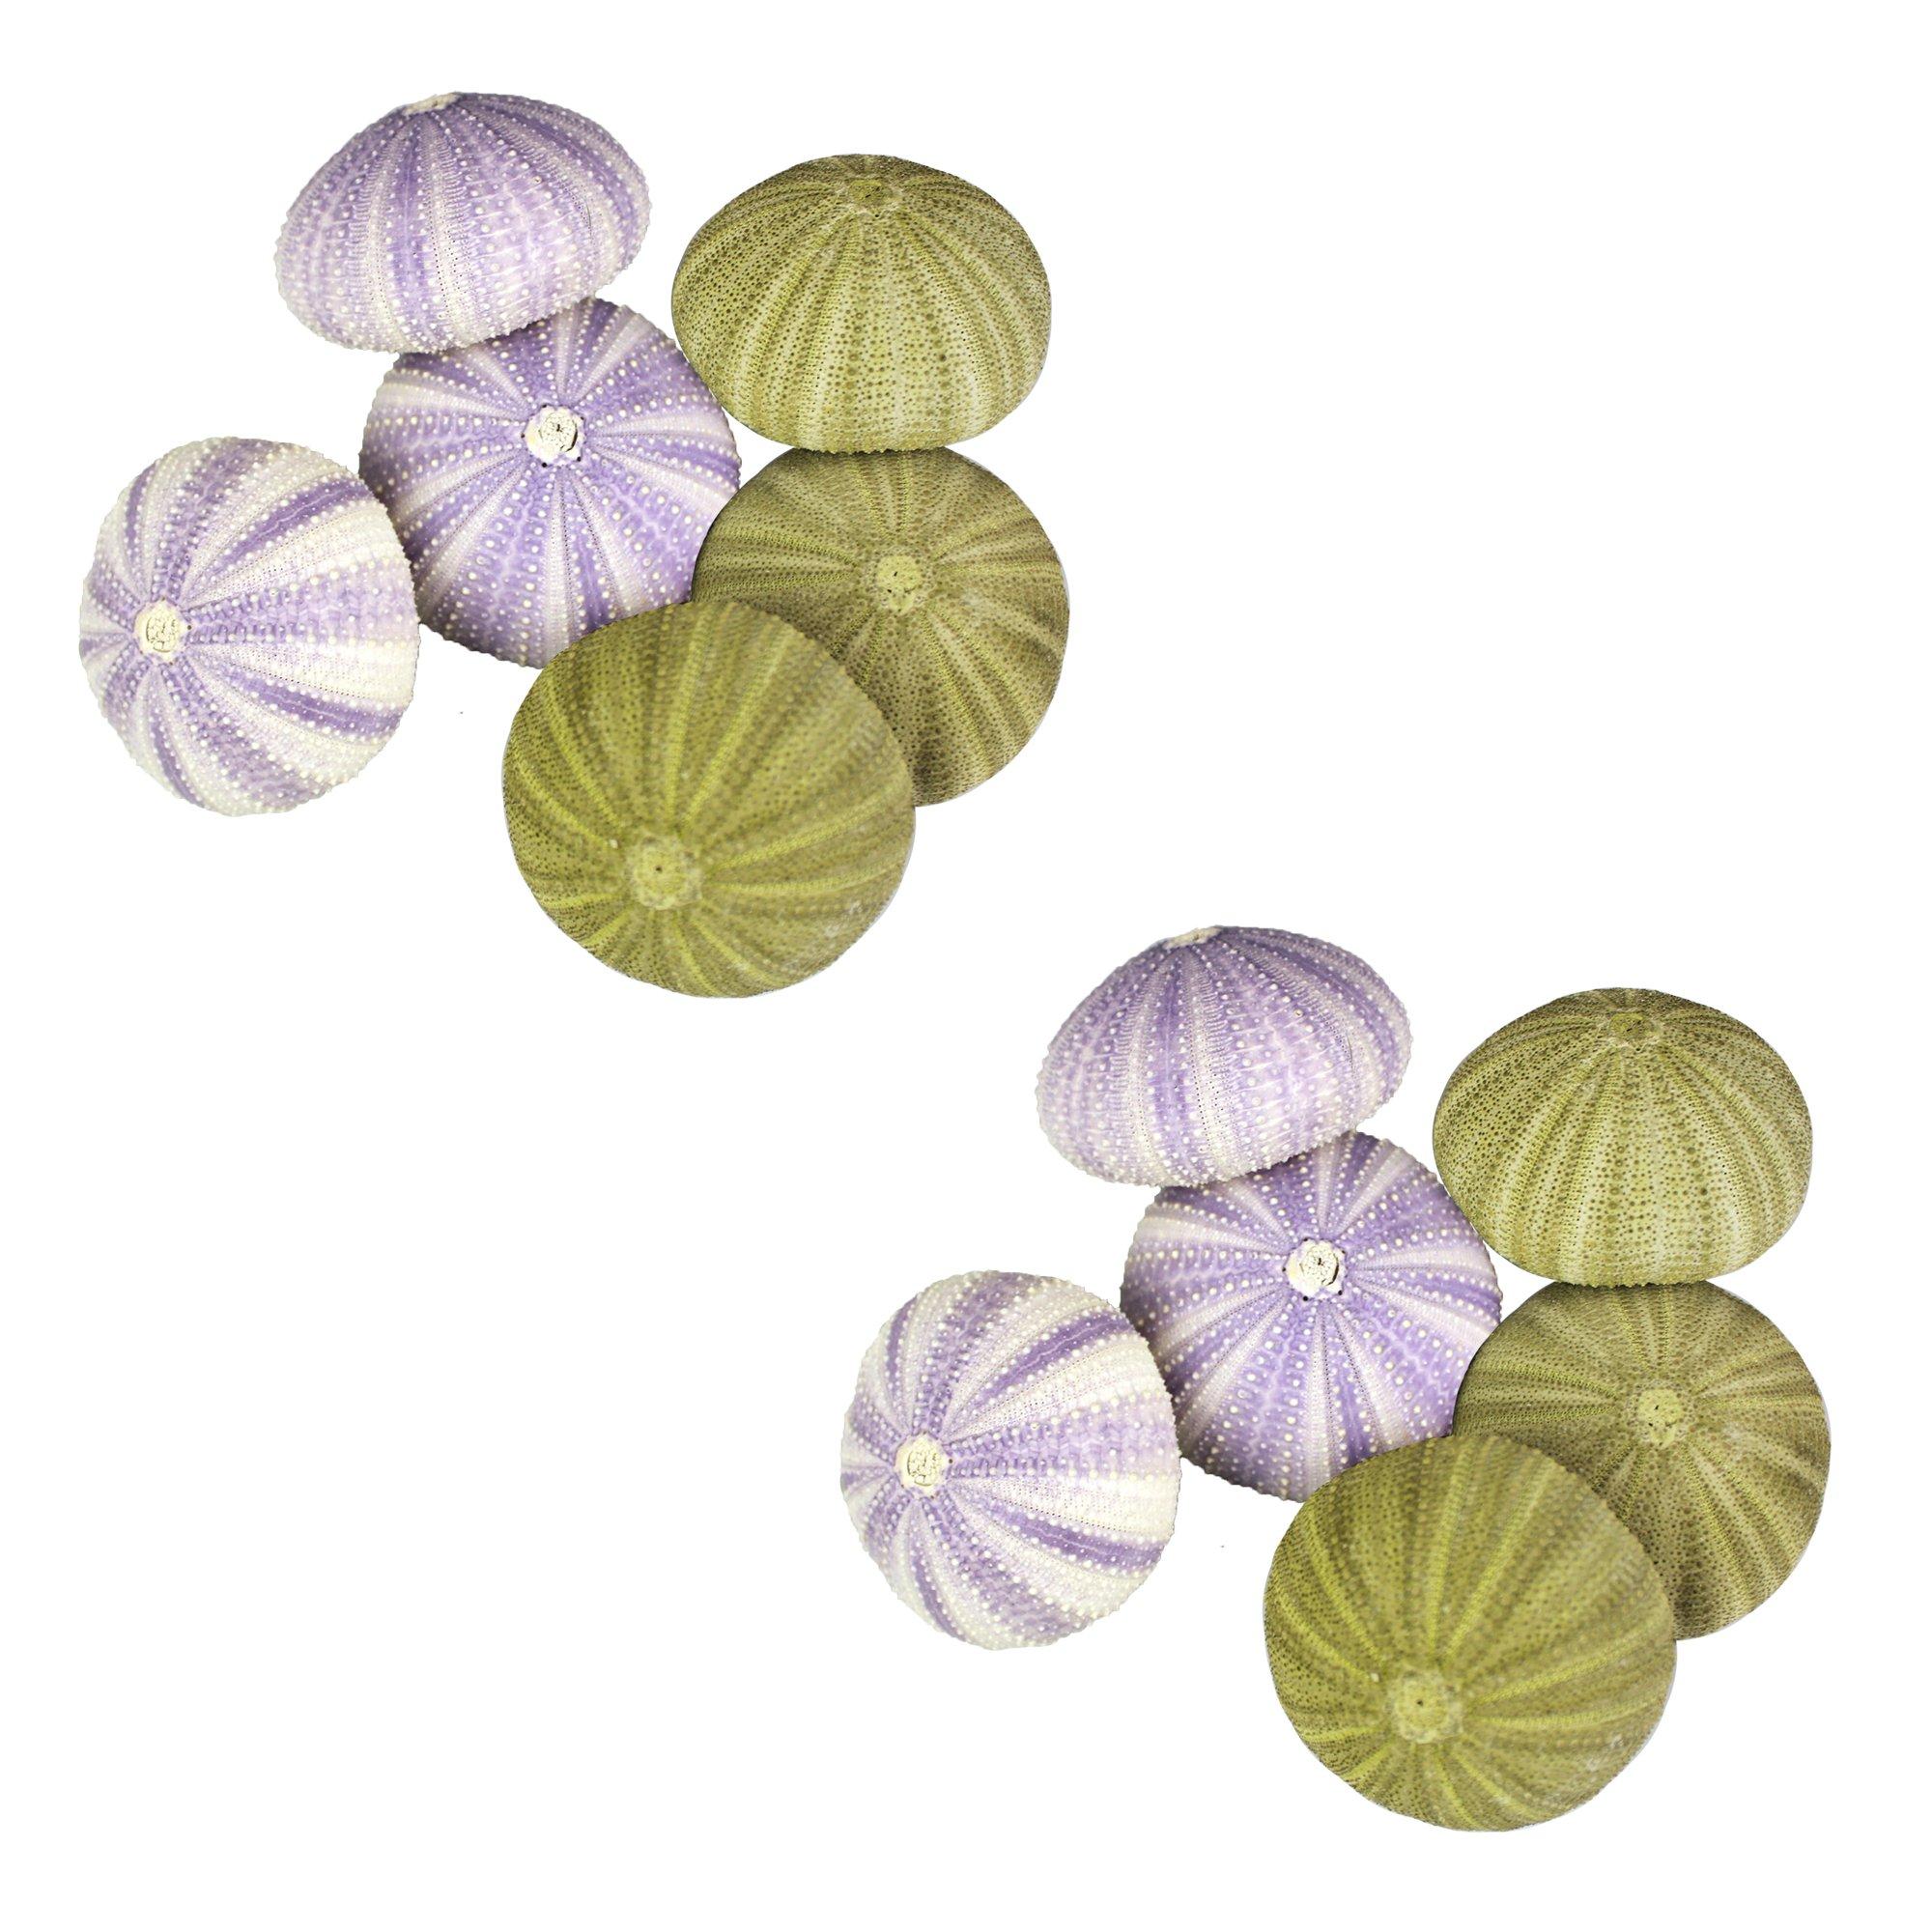 NW Wholesaler - Natural Sea Urchin Shells for Home Decor, Beach Decor, Terrariums, Air Plants, Arts & Crafts (Bundle of 12, Combo)